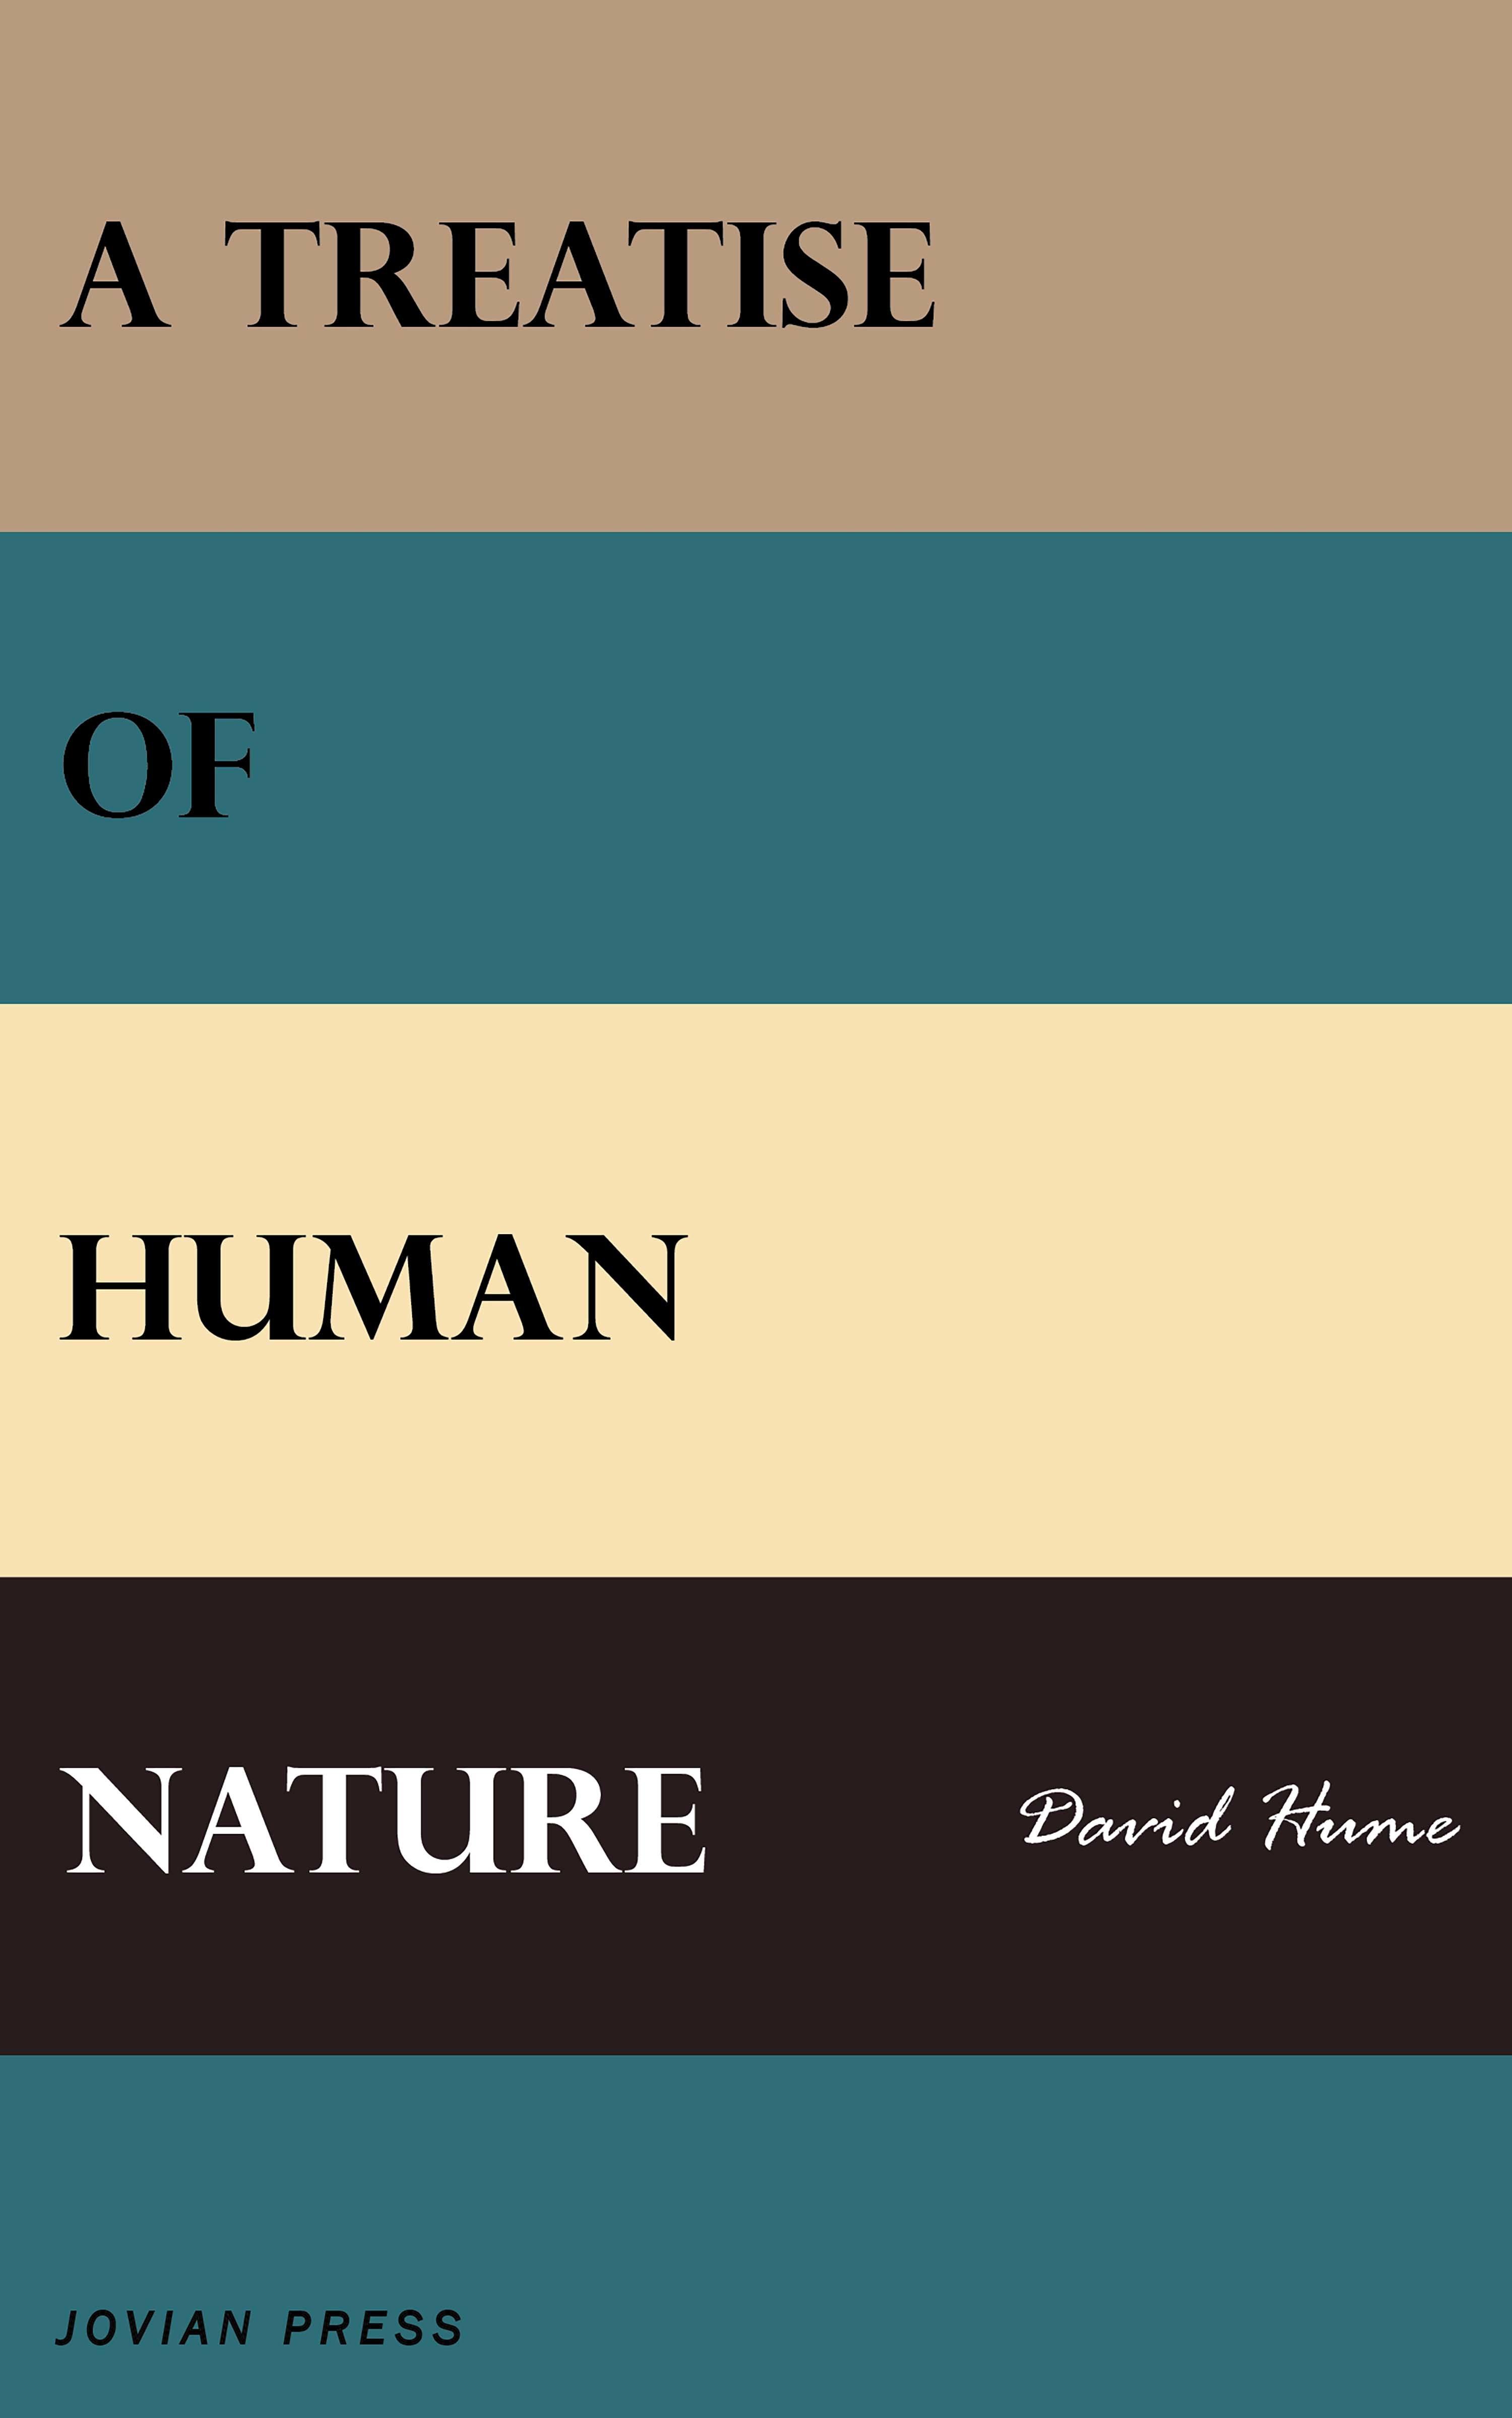 David Hume A Treatise of Human Nature отсутствует a treatise of human nature book 2